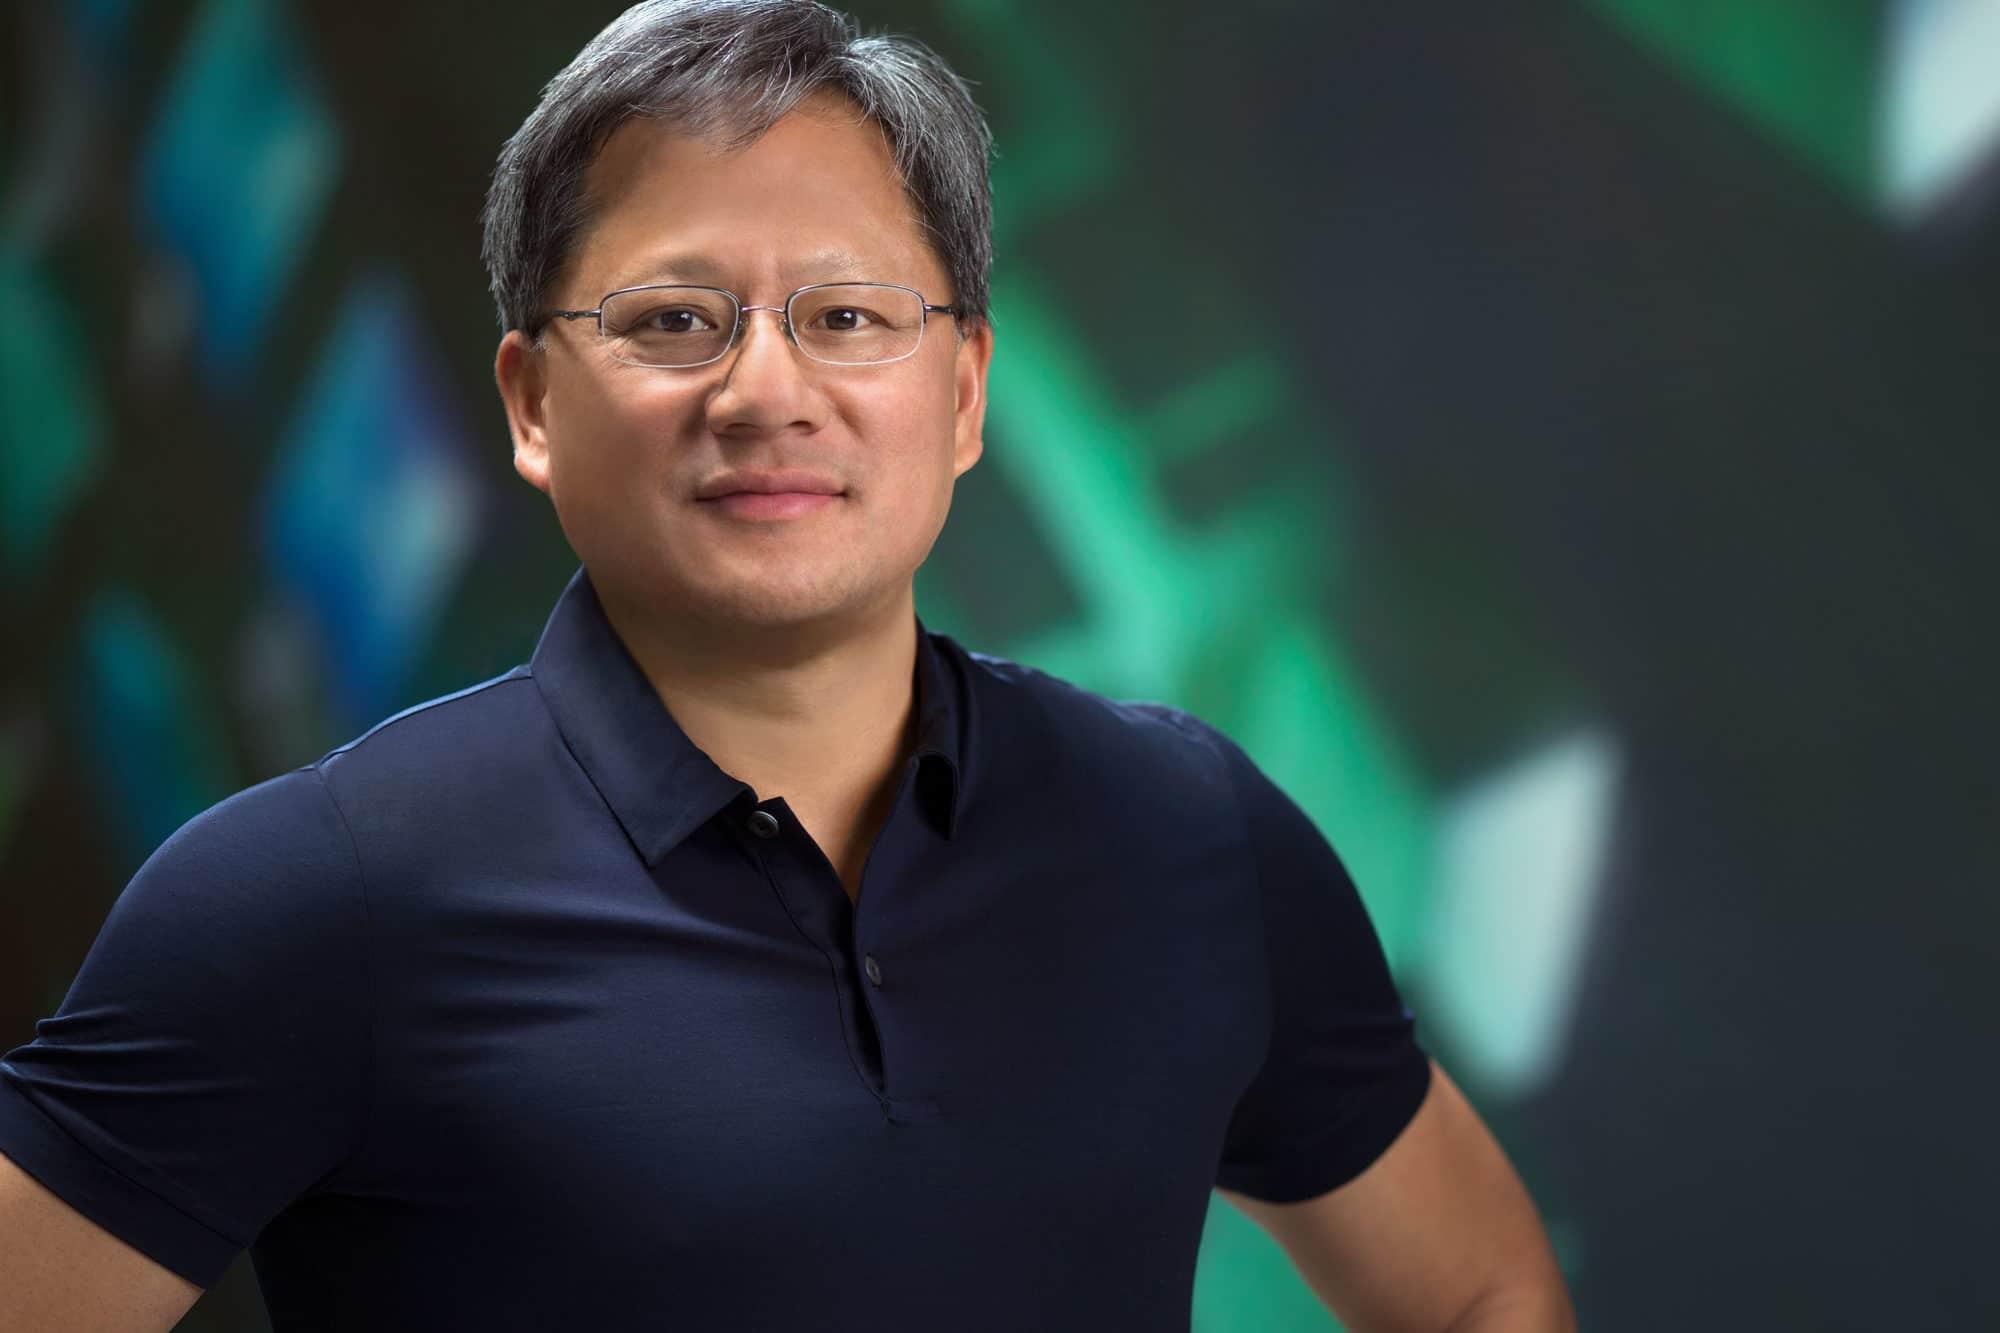 NVIDIA 將於 SC15 年會擘畫加速運算技術的成長之路